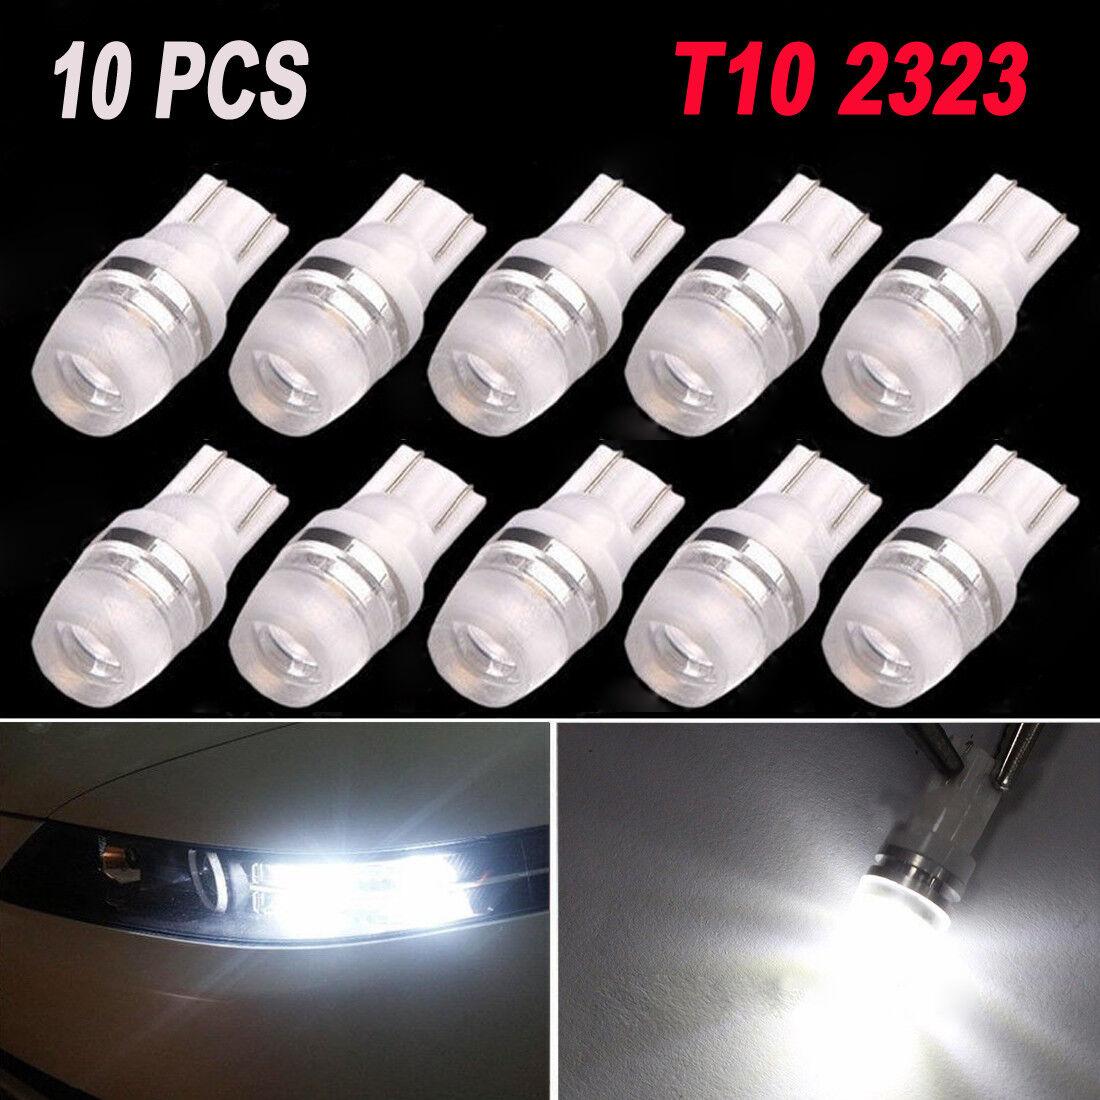 Super White High Power T10 Wedge SAMSUNG LED Light Bulbs W5W 192 168 194 12V x10